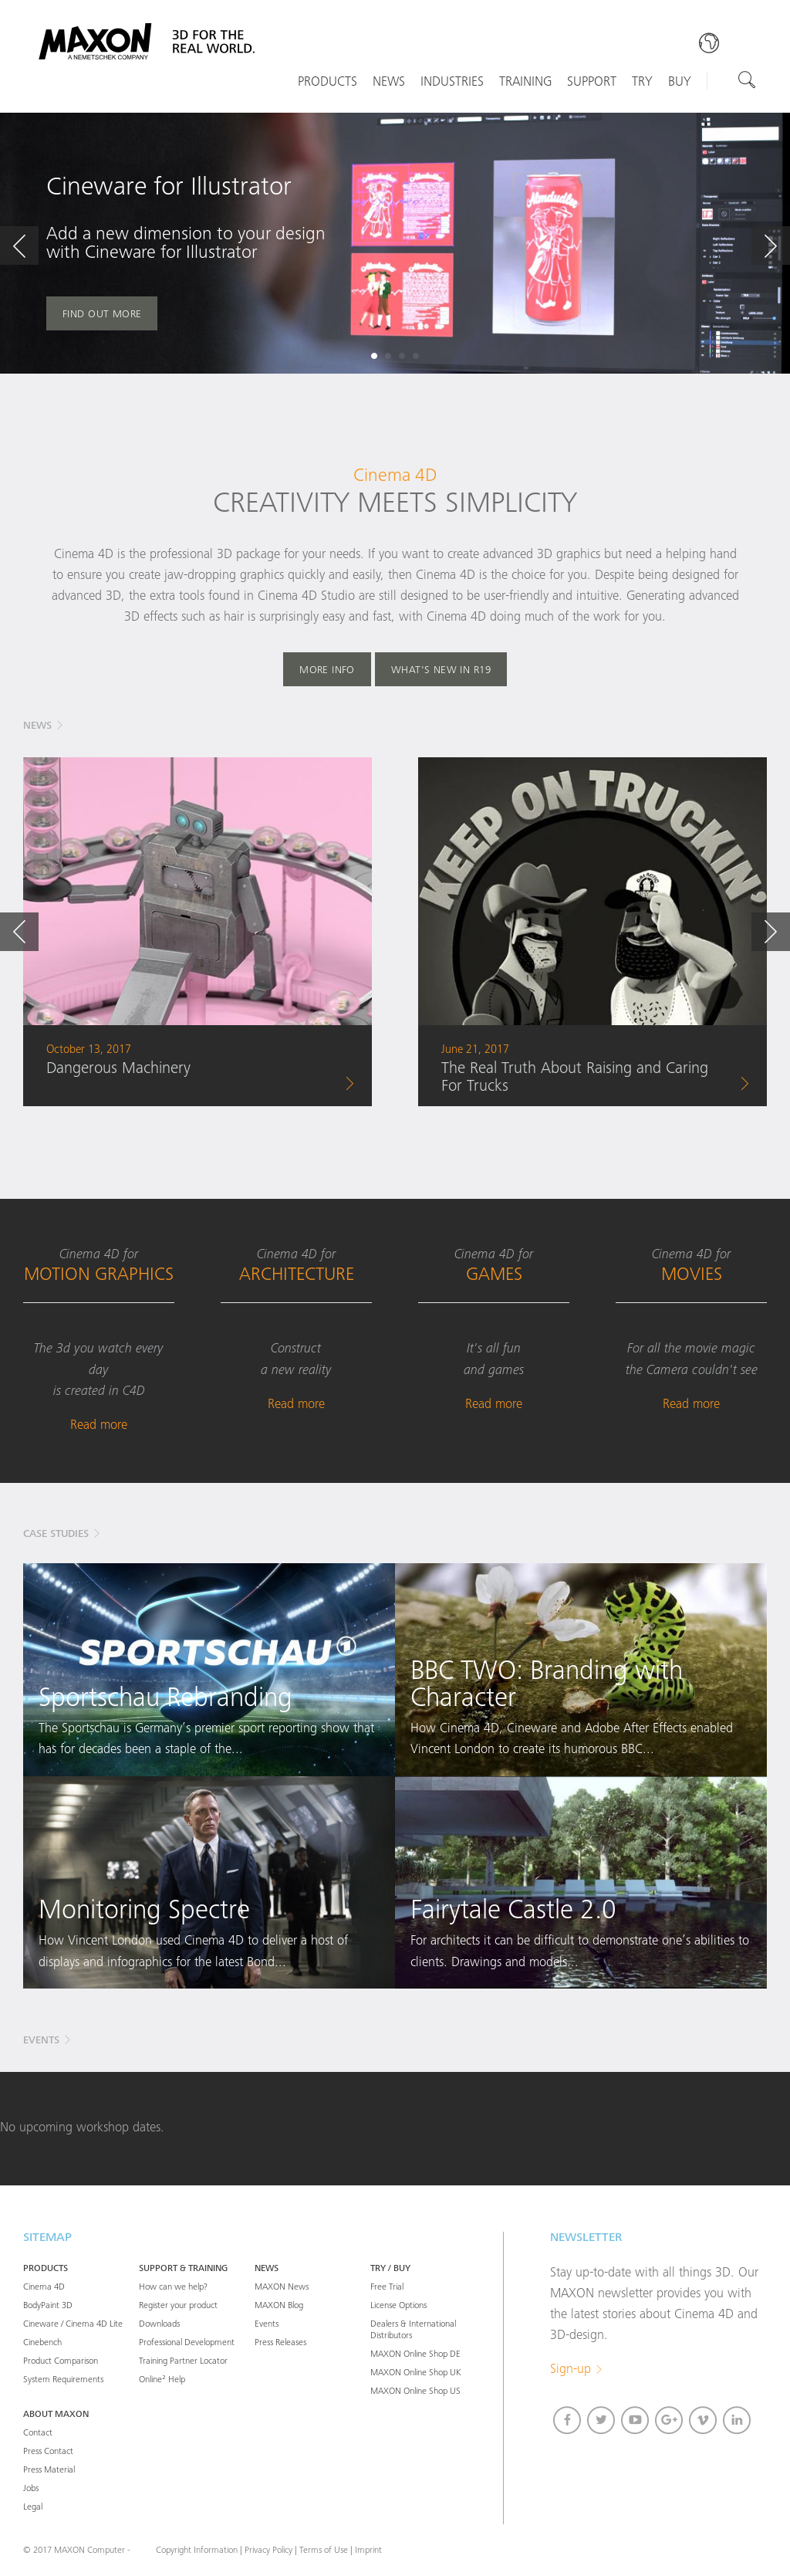 MAXON Competitors, Revenue and Employees - Owler Company Profile